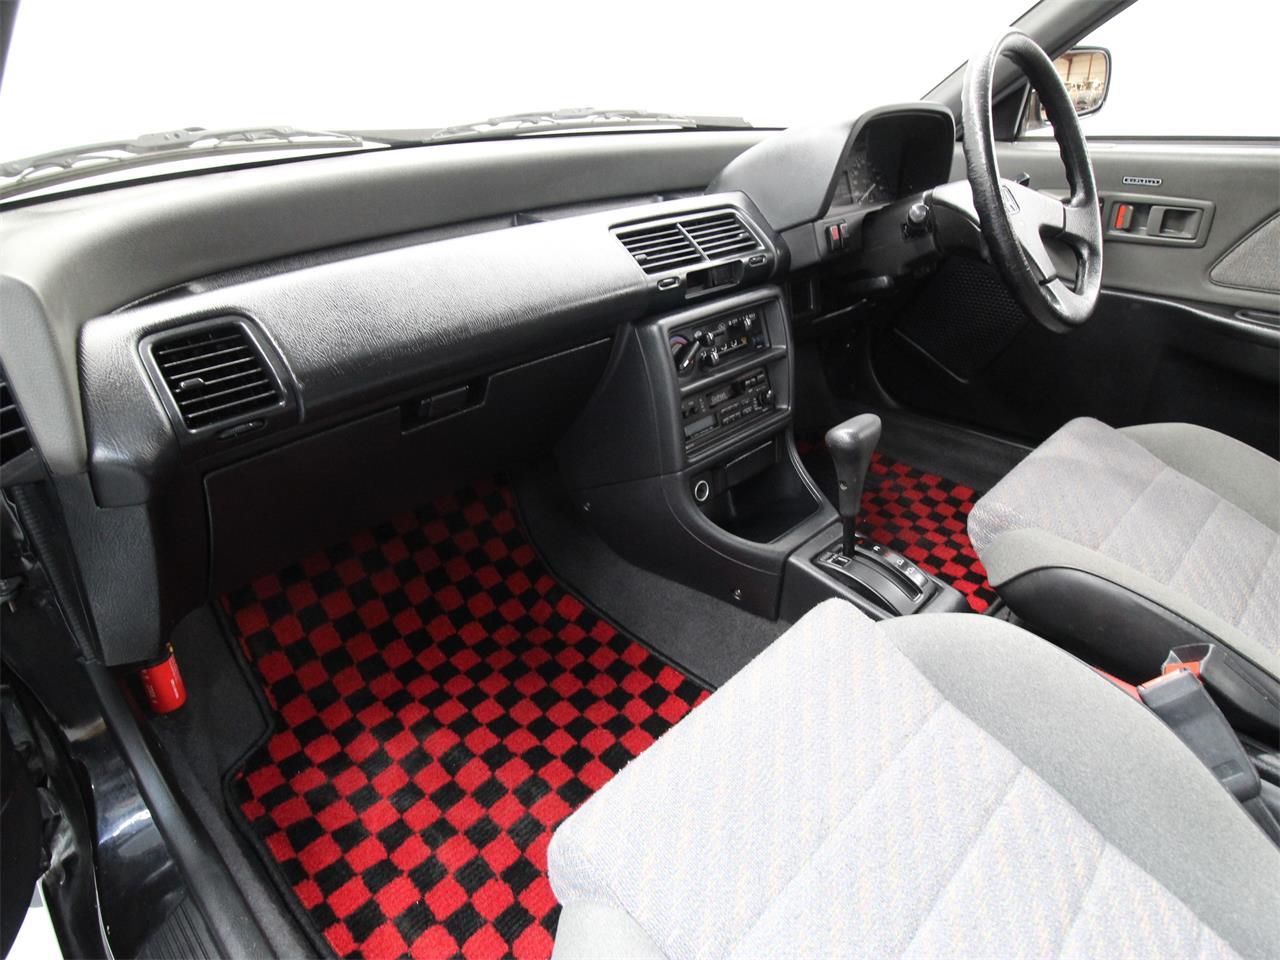 1991 Honda Civic (CC-1297726) for sale in Christiansburg, Virginia